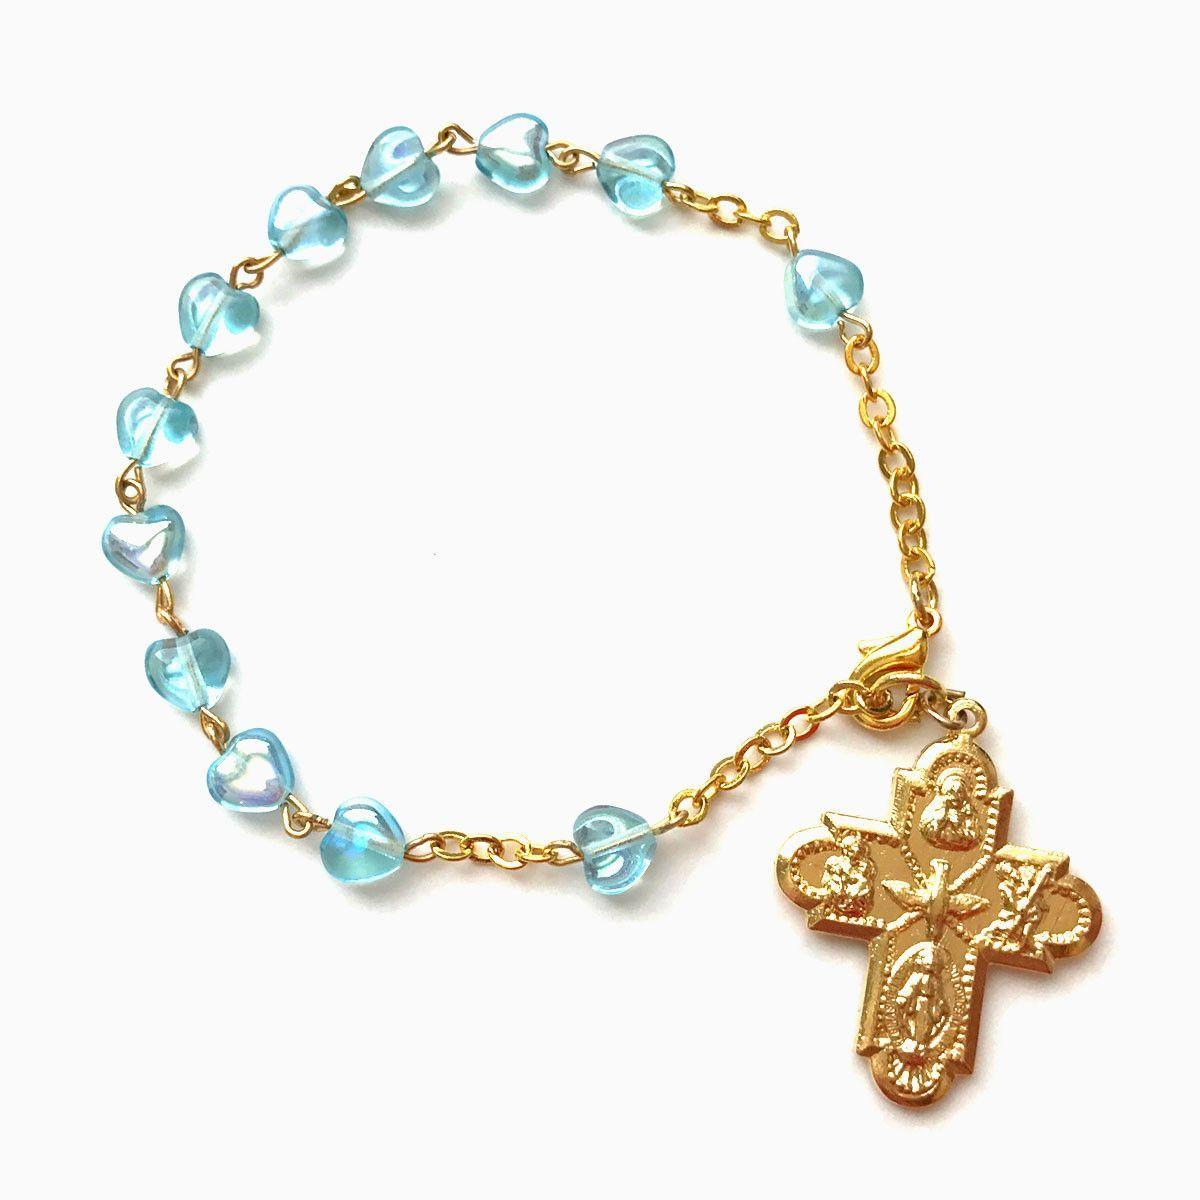 Aqua glass heart beads rosary bracelet get it here